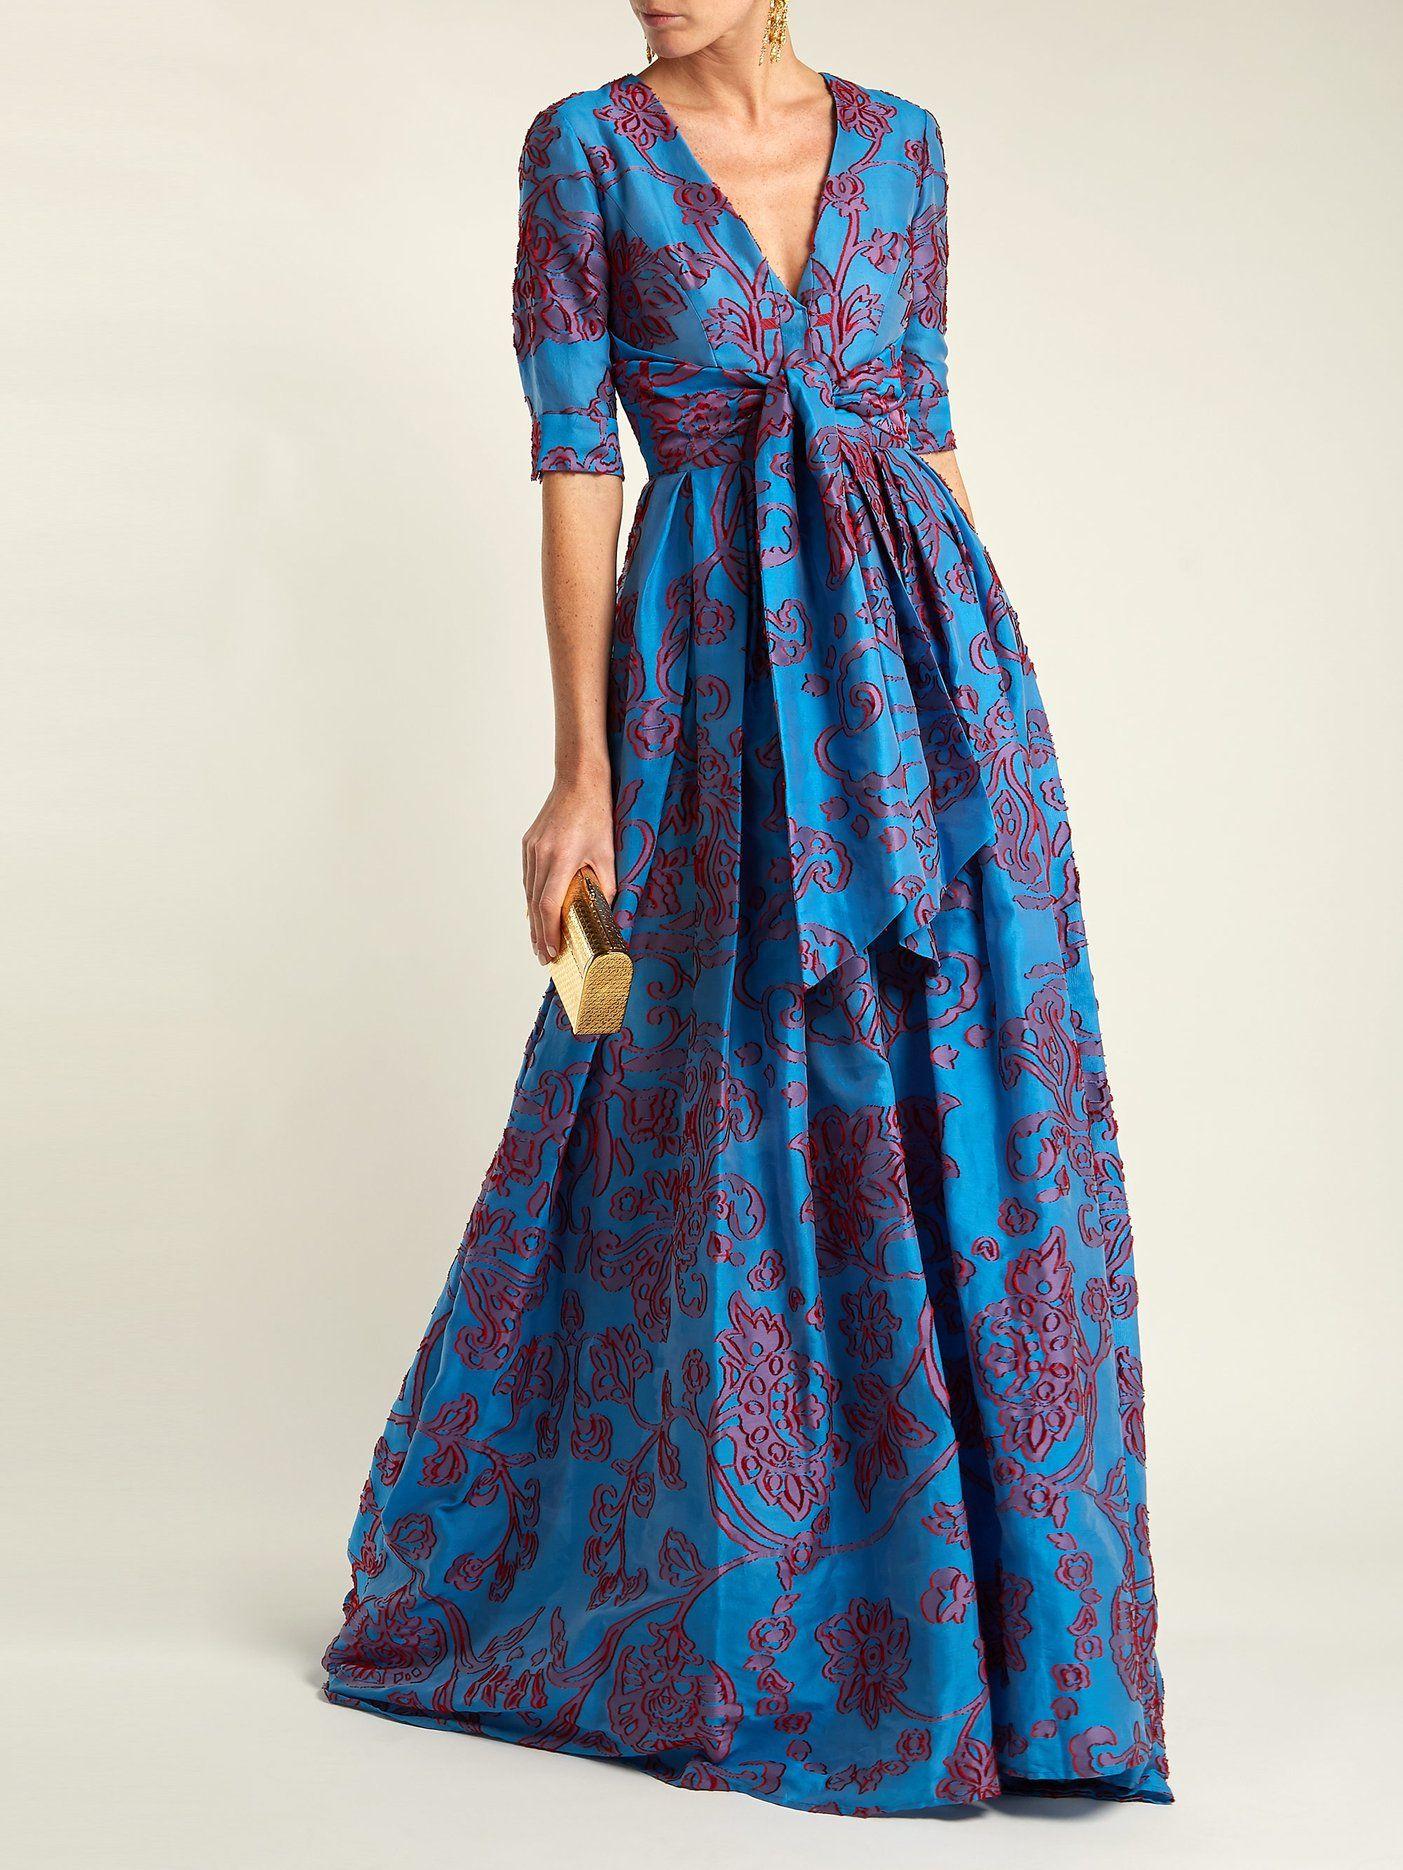 9d599926ebb04 Knotted floral devoré gown   Carolina Herrera   MATCHESFASHION.COM ...